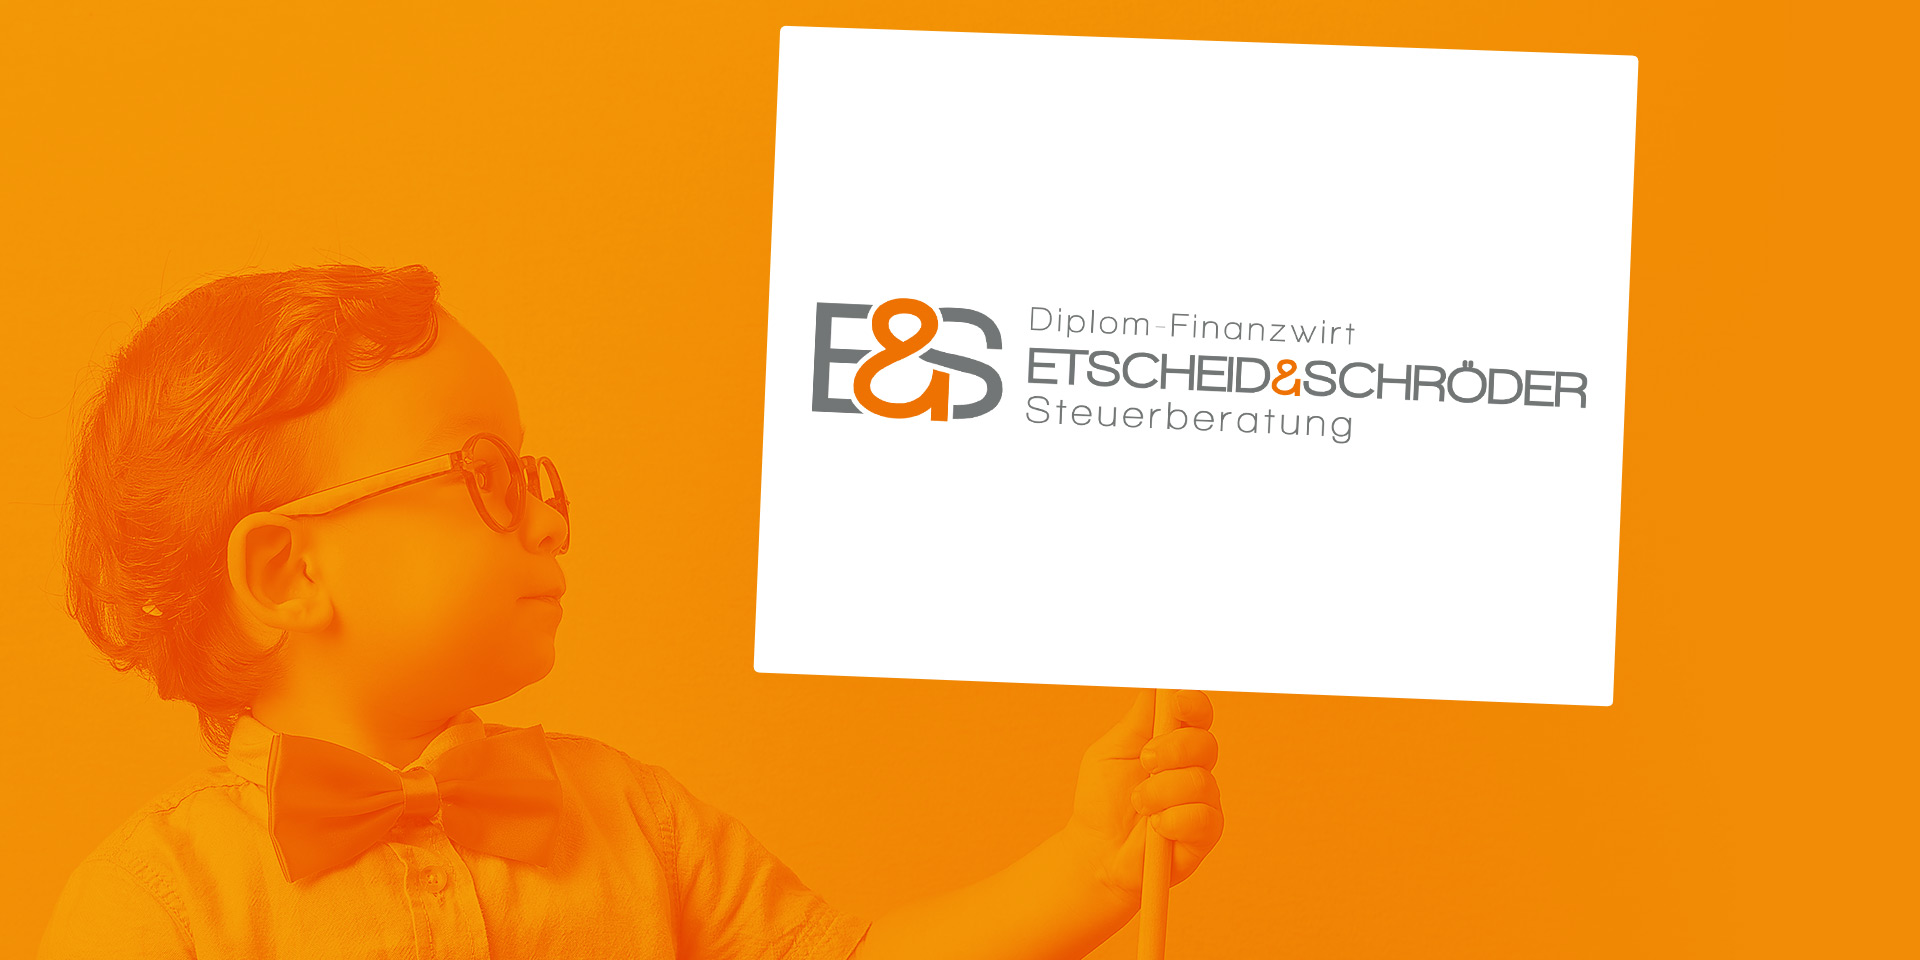 Etscheid & Schröder Steuerberatergesellschaft aus Wuppertal